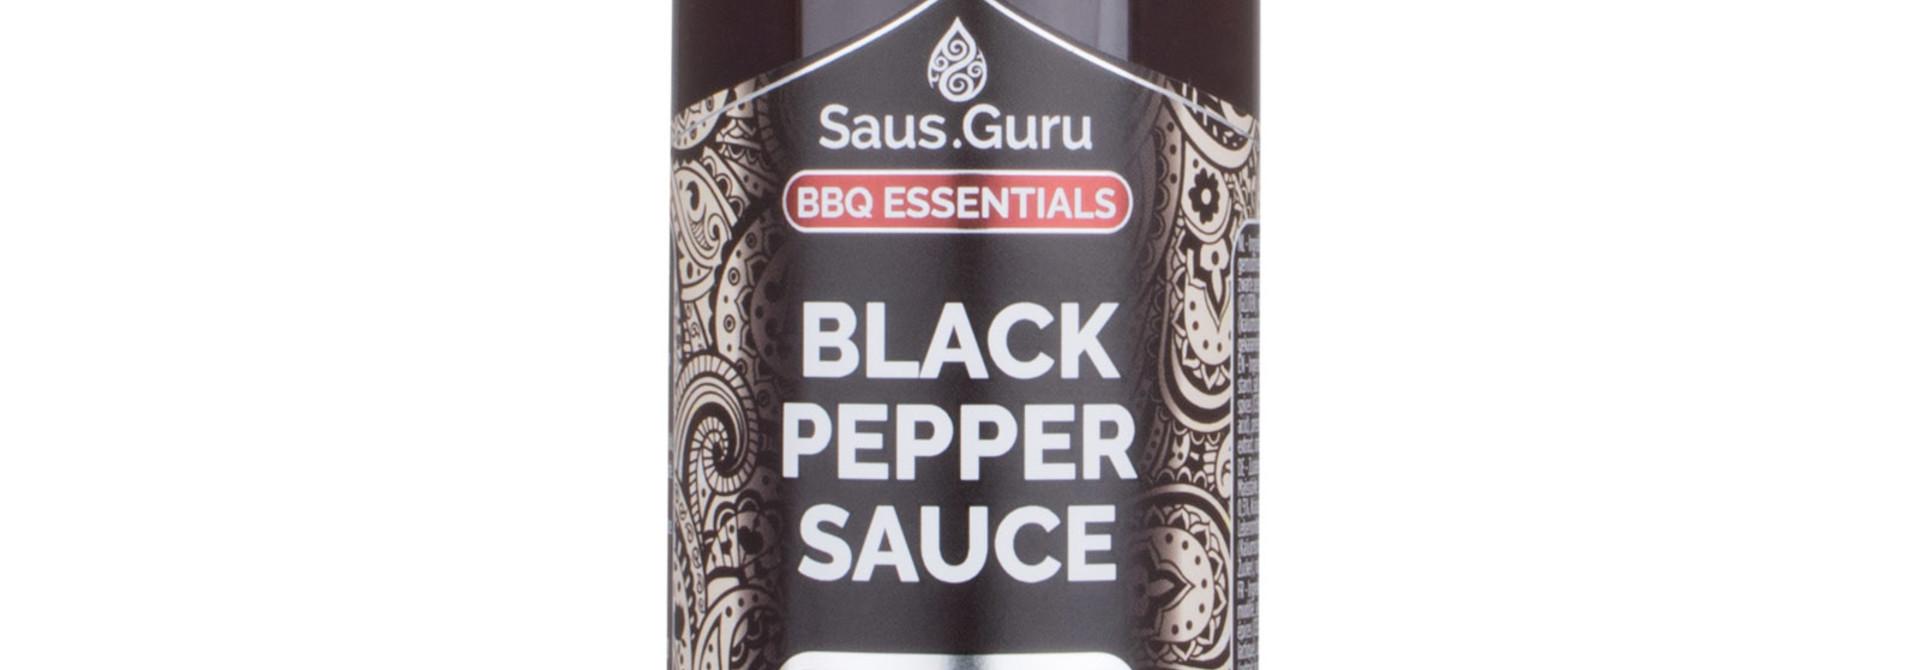 Saus.Guru's Black Pepper BBQ Sauce